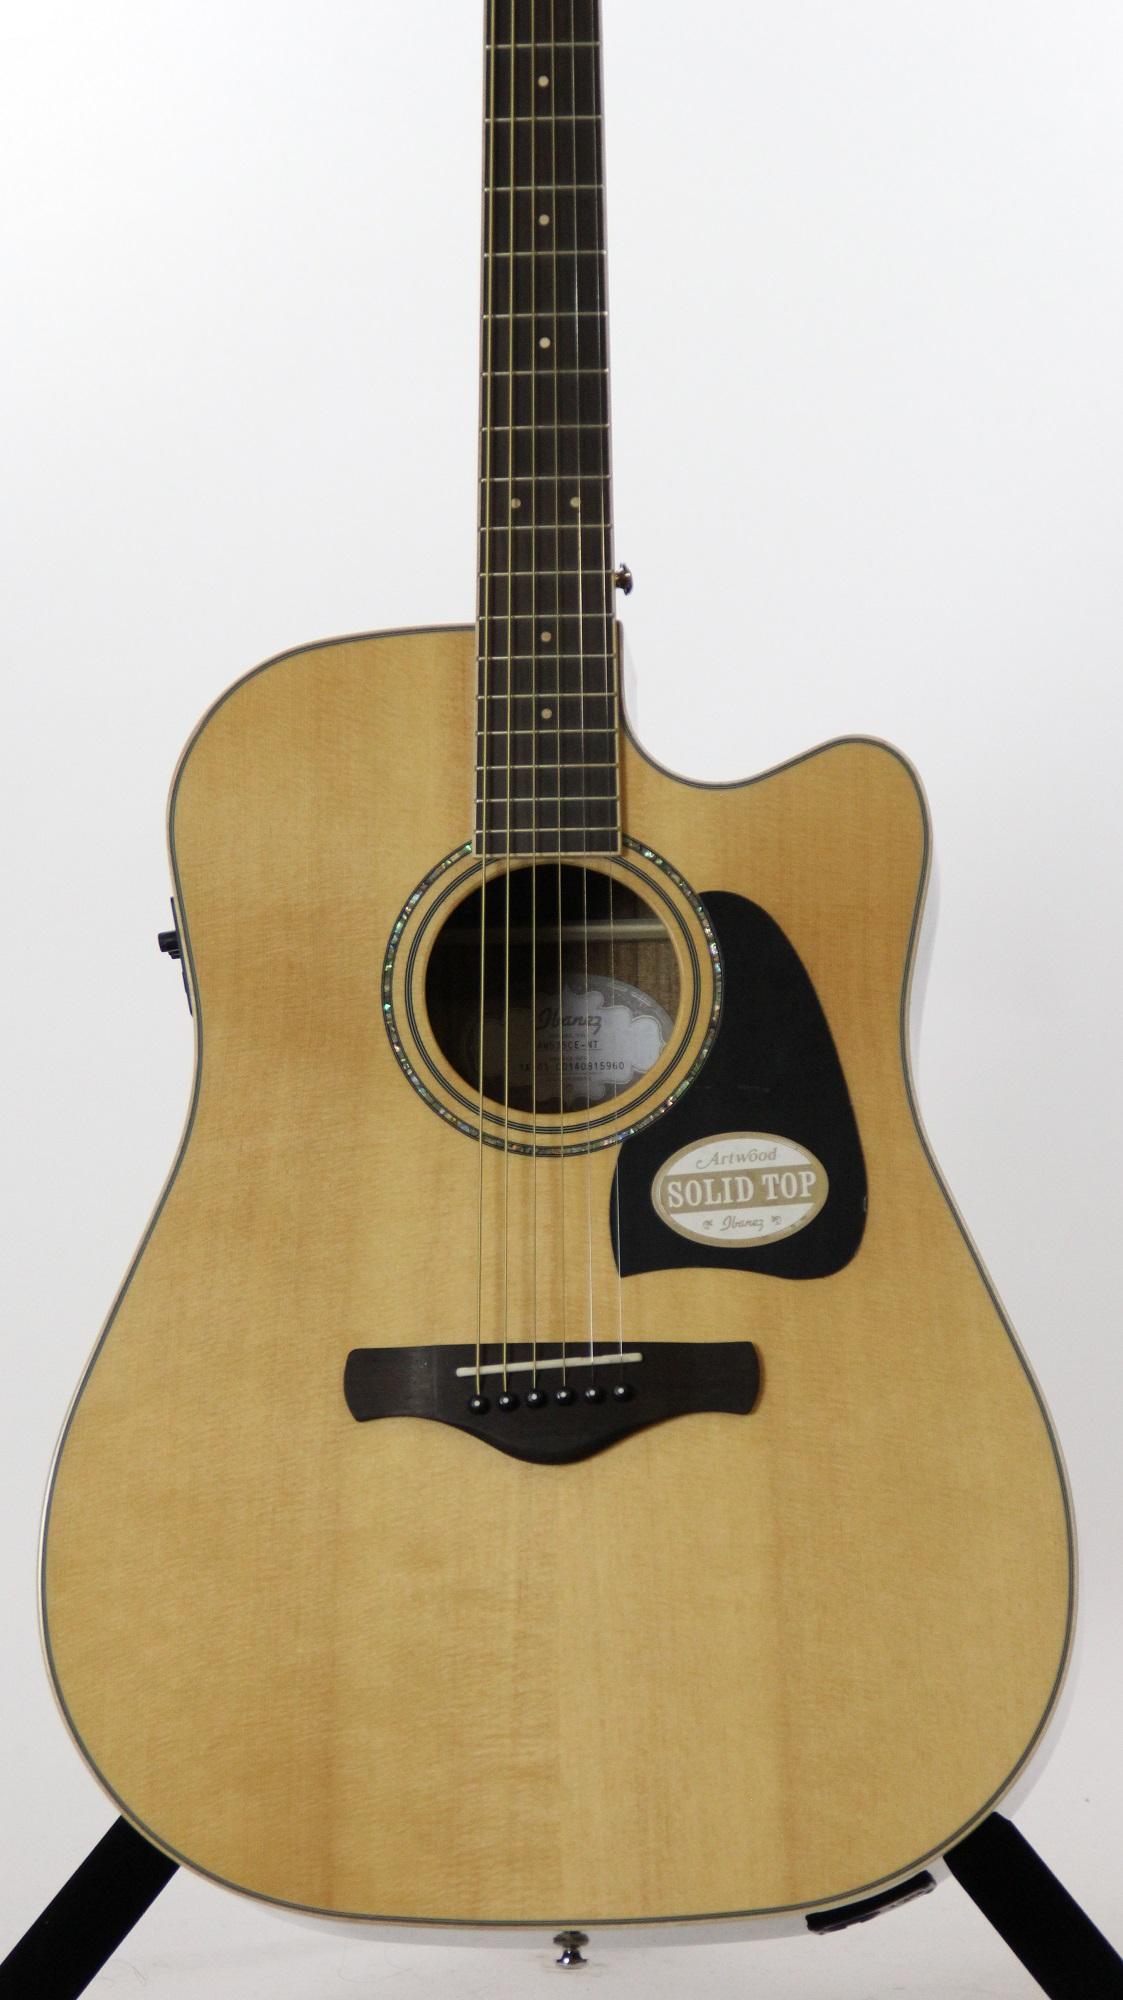 Electric Guitar Strings On Acoustic Reddit : ibanez aw535ce artwood grand concert electric acoustic guitar 6 ~ Russianpoet.info Haus und Dekorationen